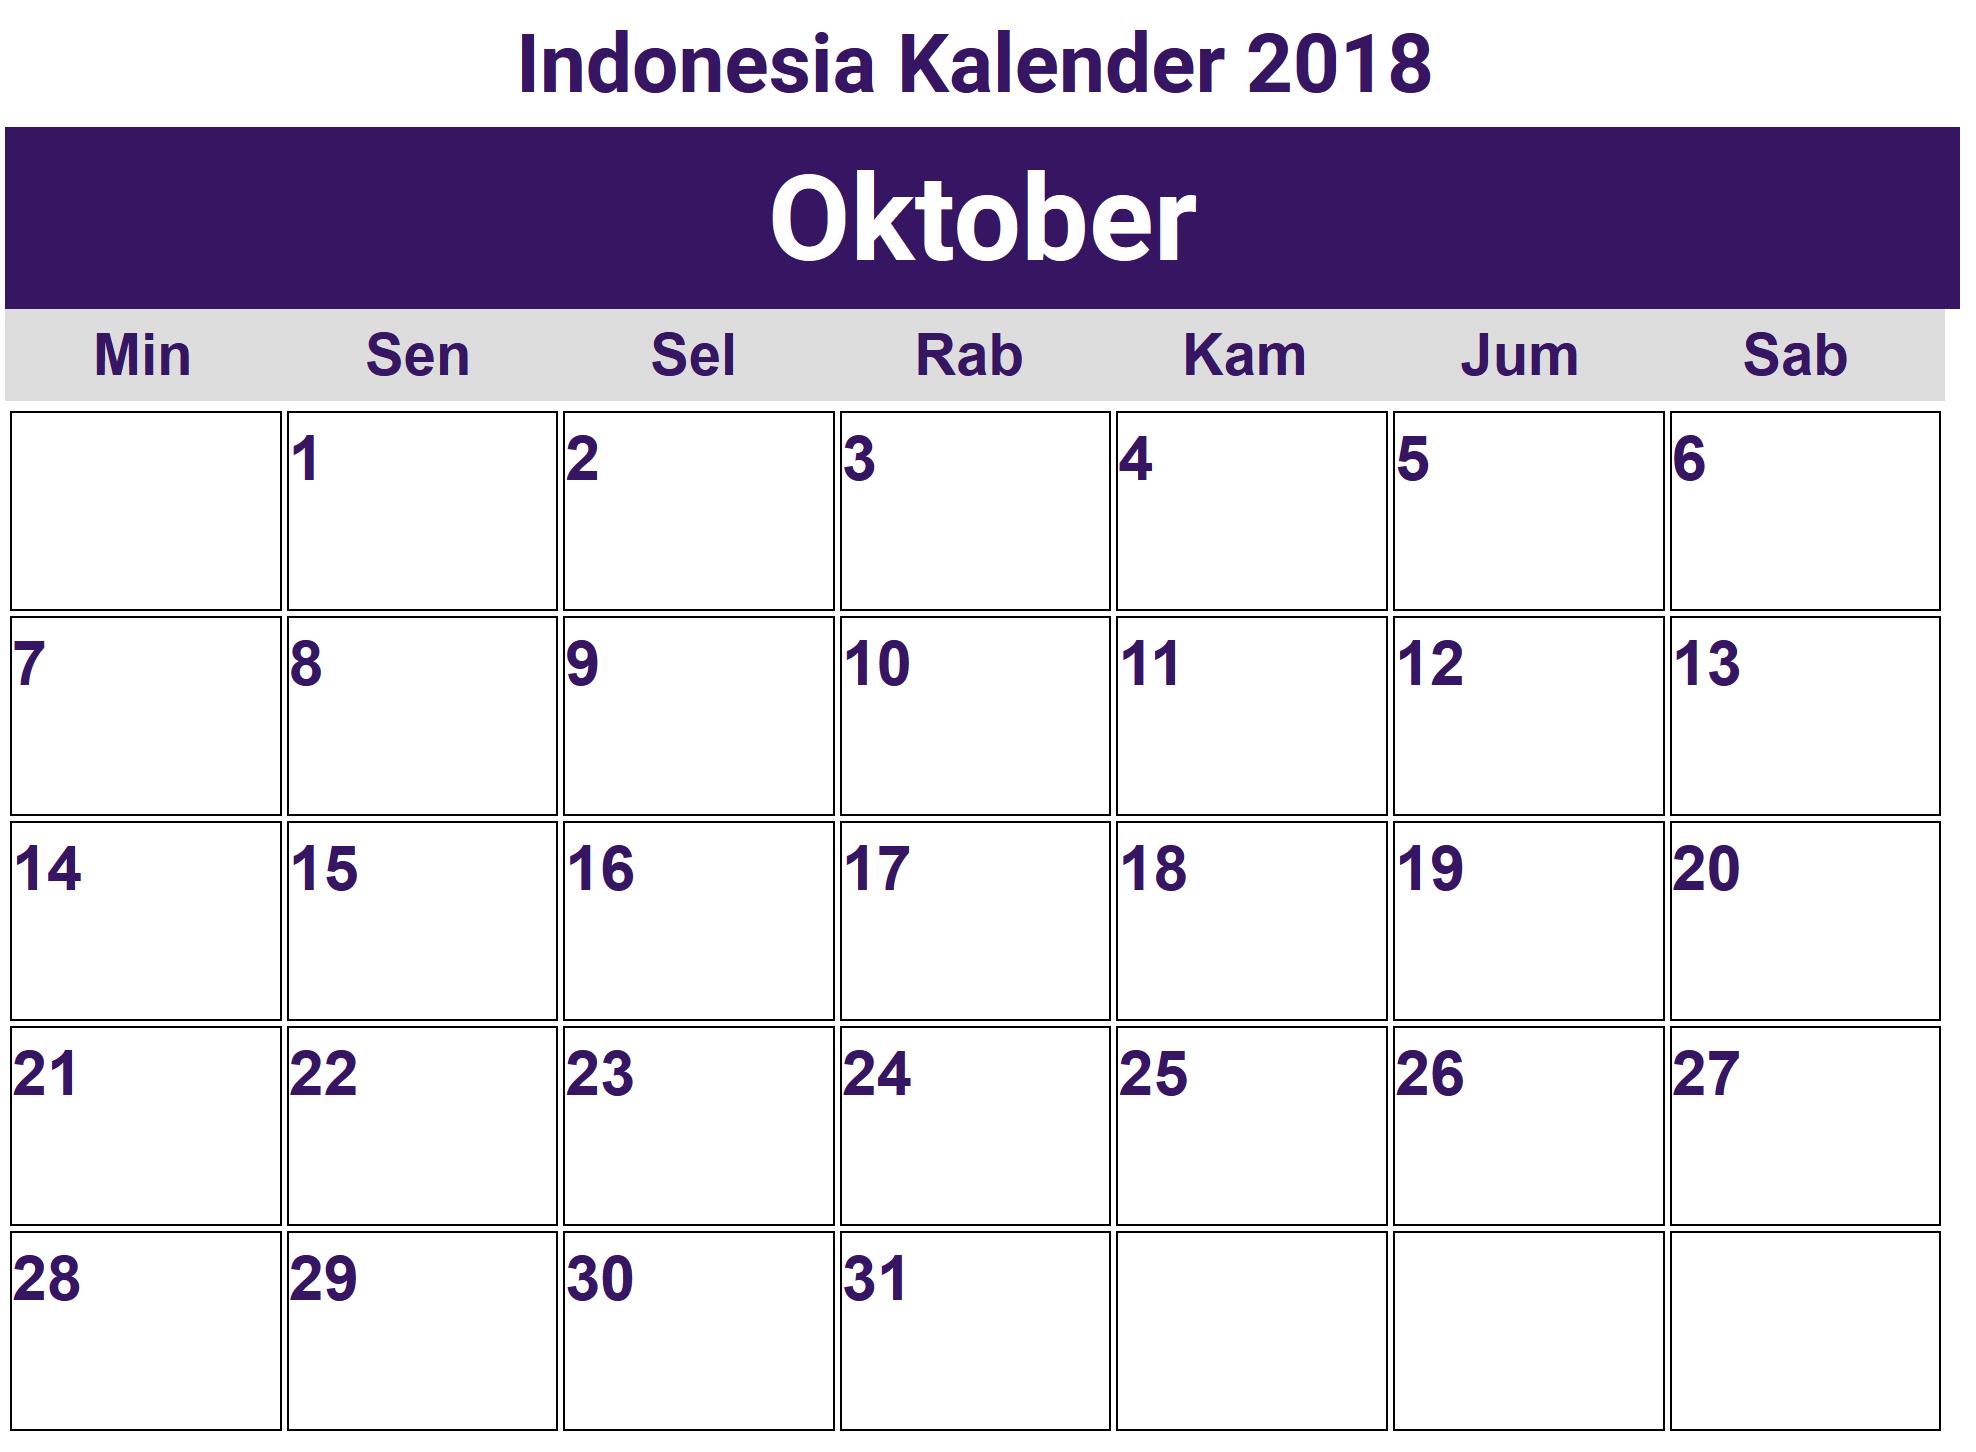 Kalender Oktober 2018 Indonesia